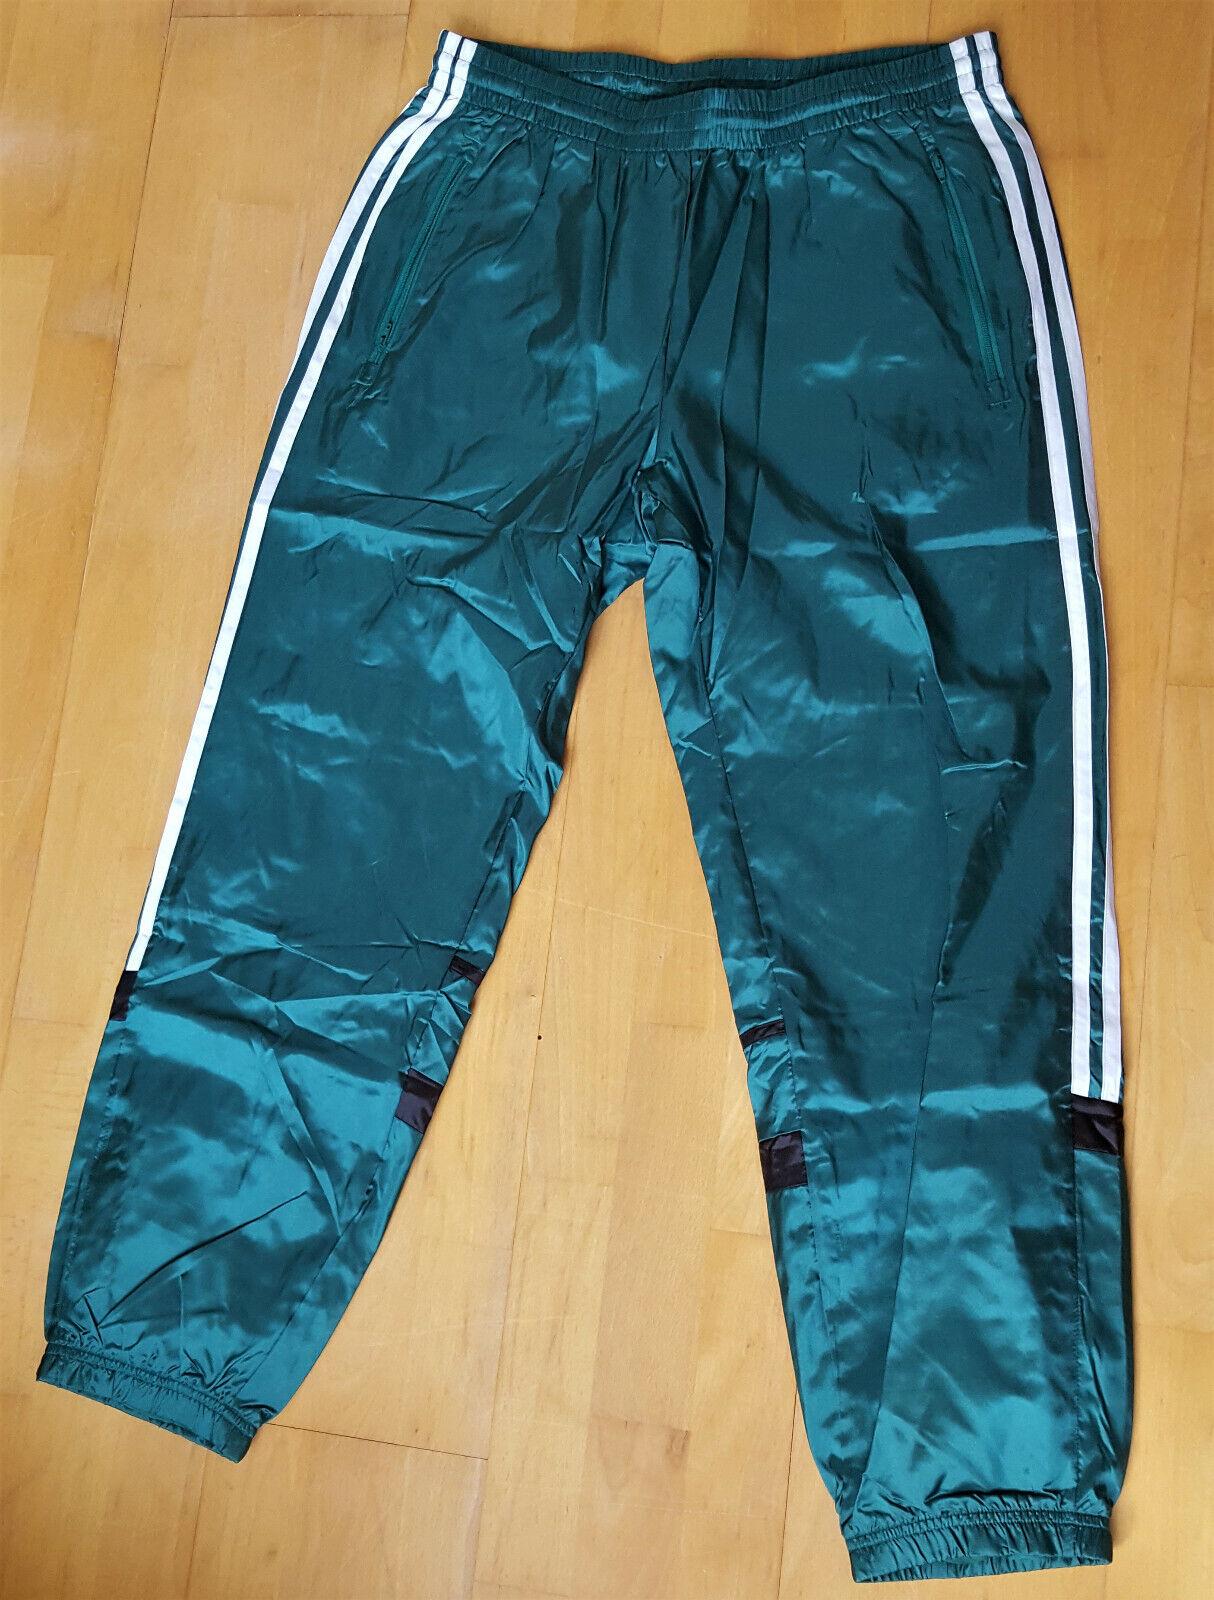 adidas jogginghose CLR-84 Woven Track Pants (Sub Green) Gr.L